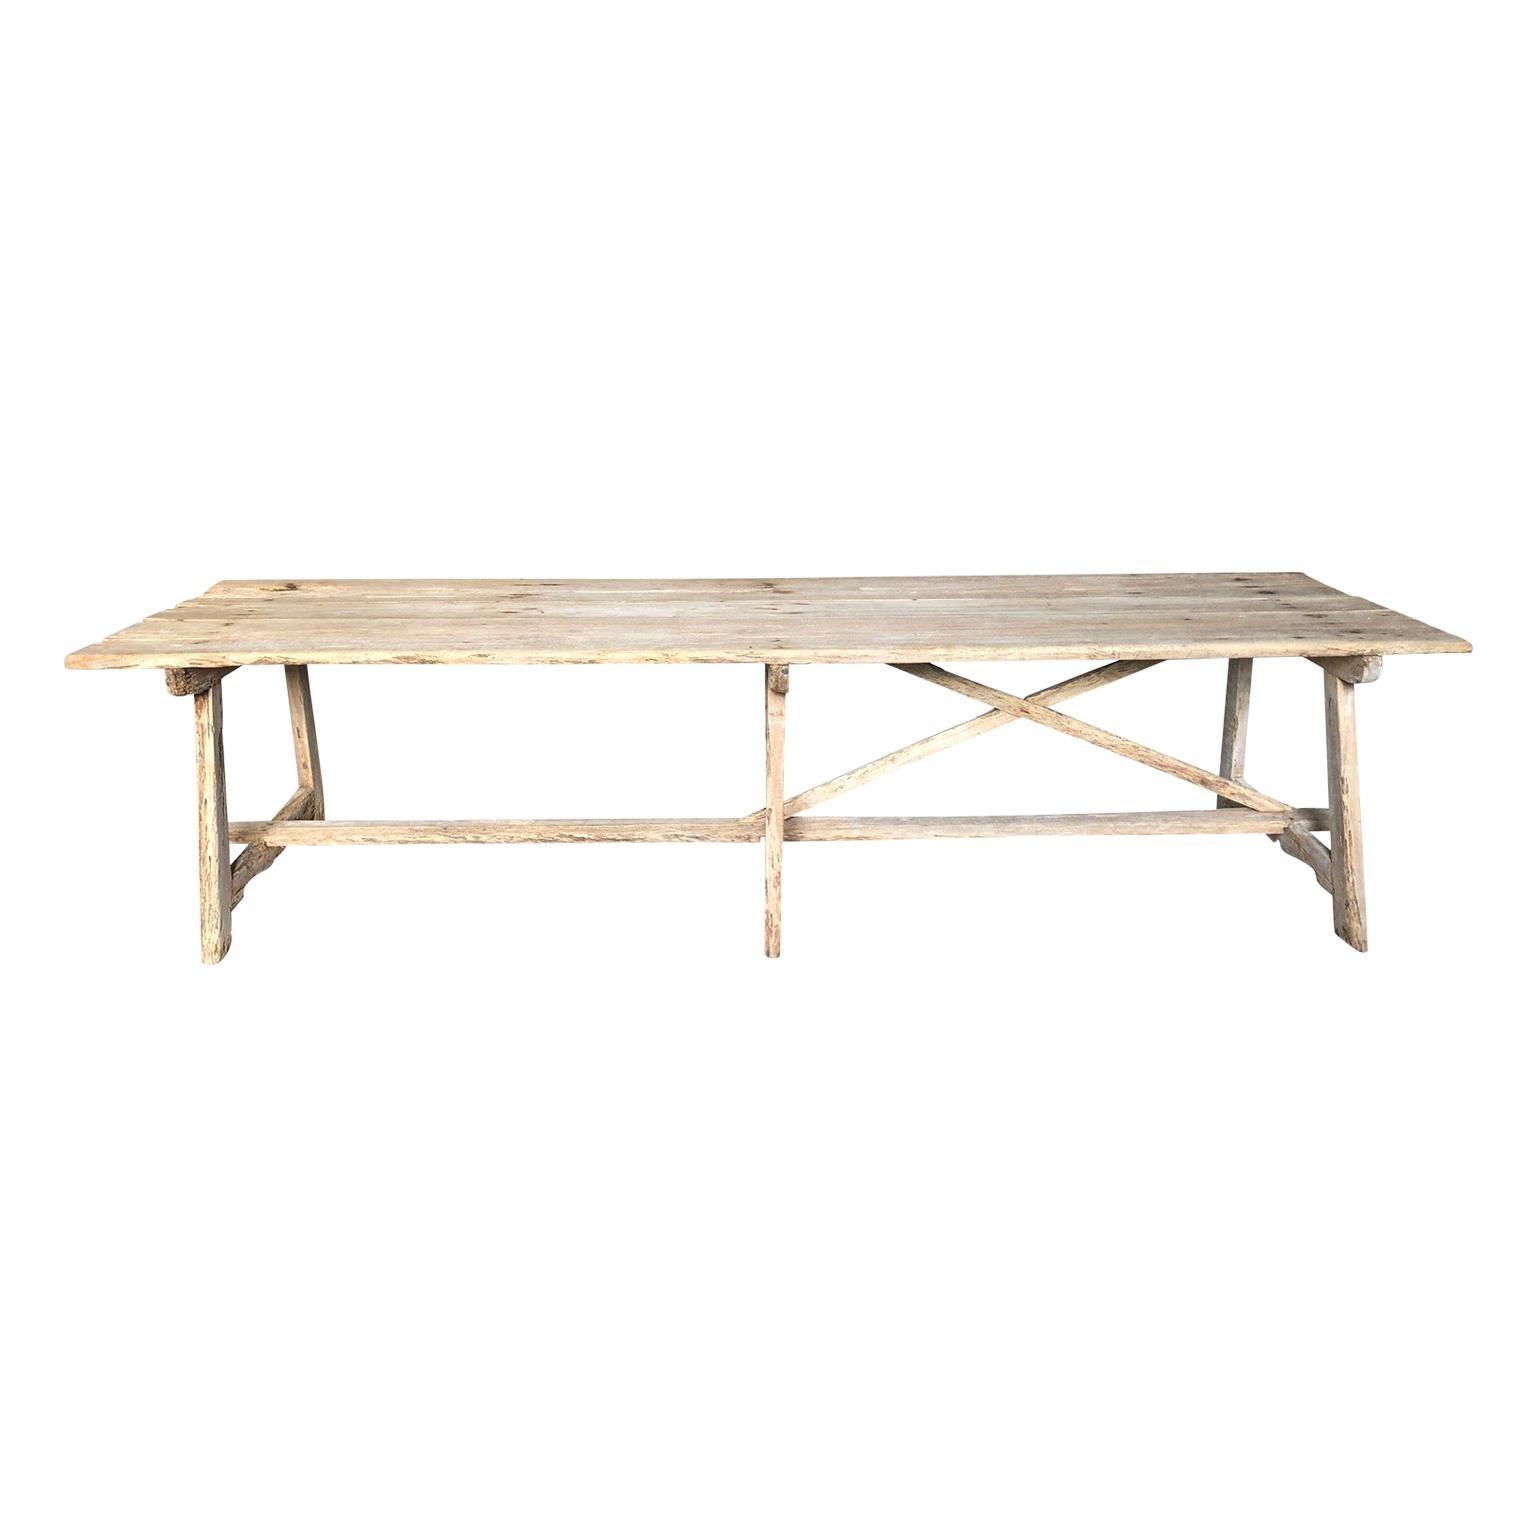 17th Century Catalan Farm Table